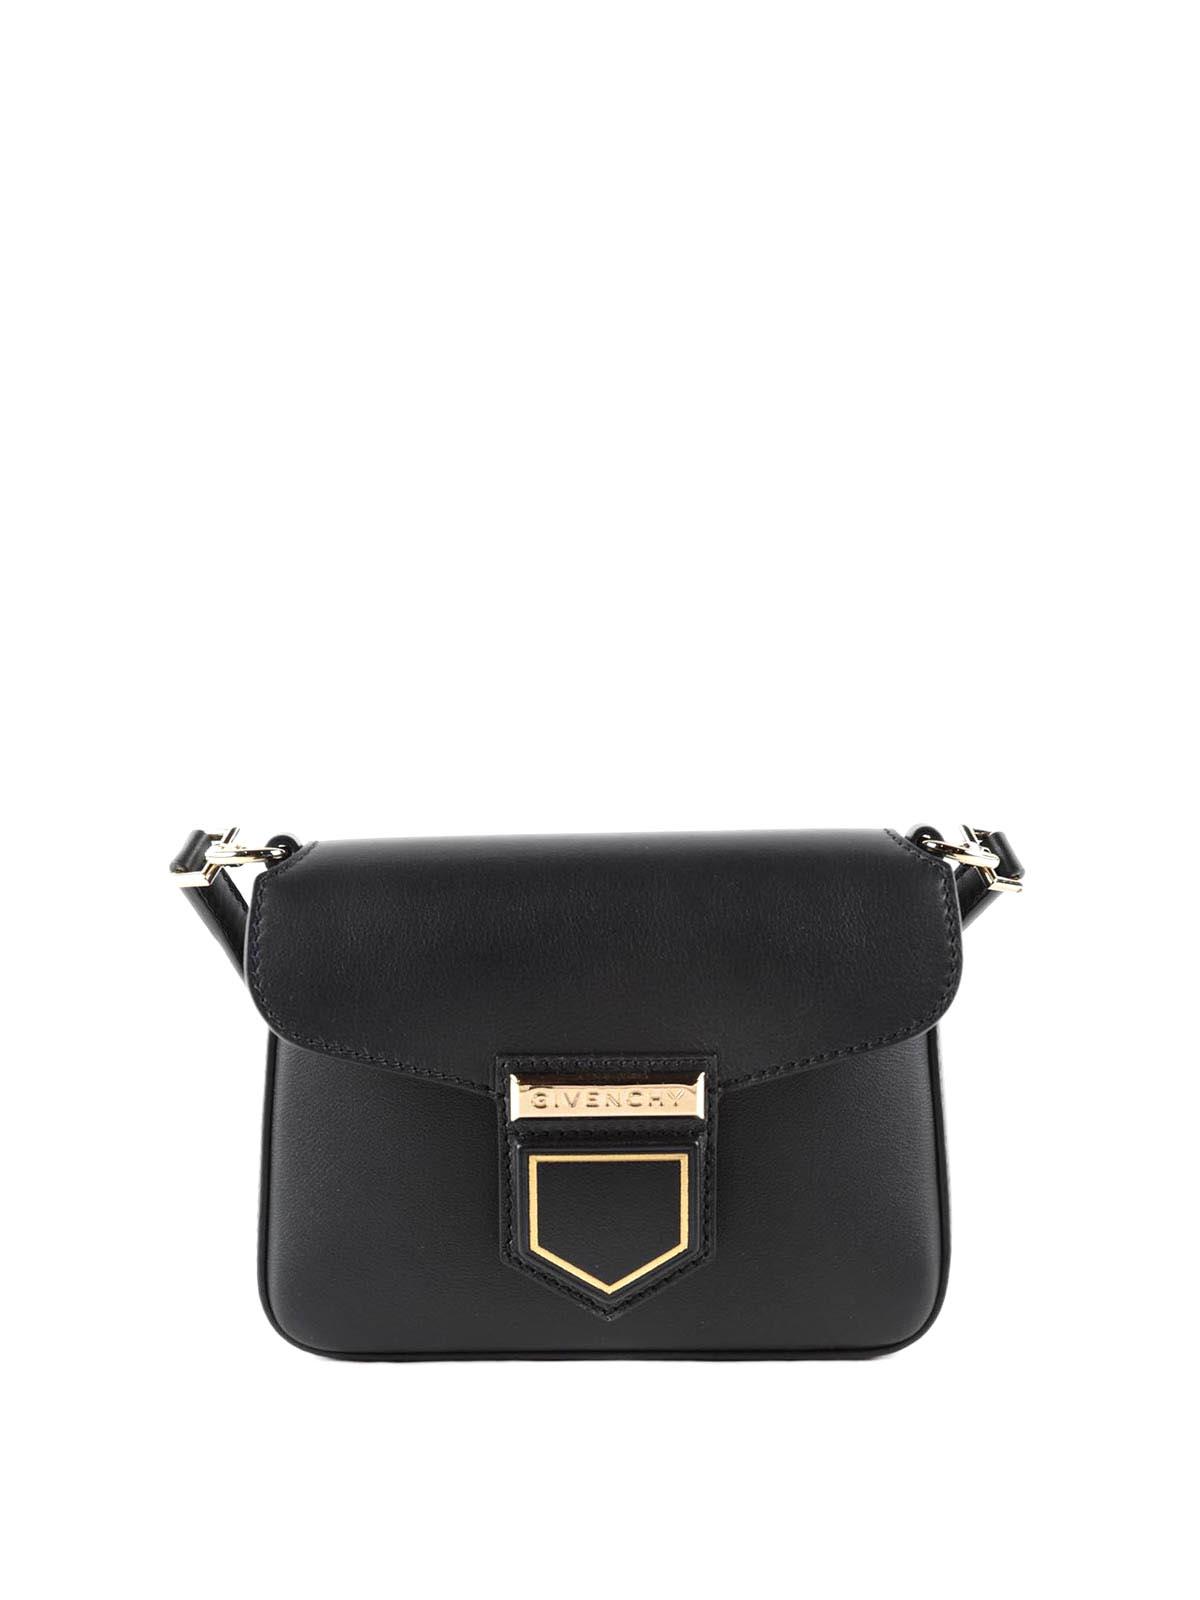 5cc9b6536eba Givenchy - Nobile mini bag - shoulder bags - 5660009 001